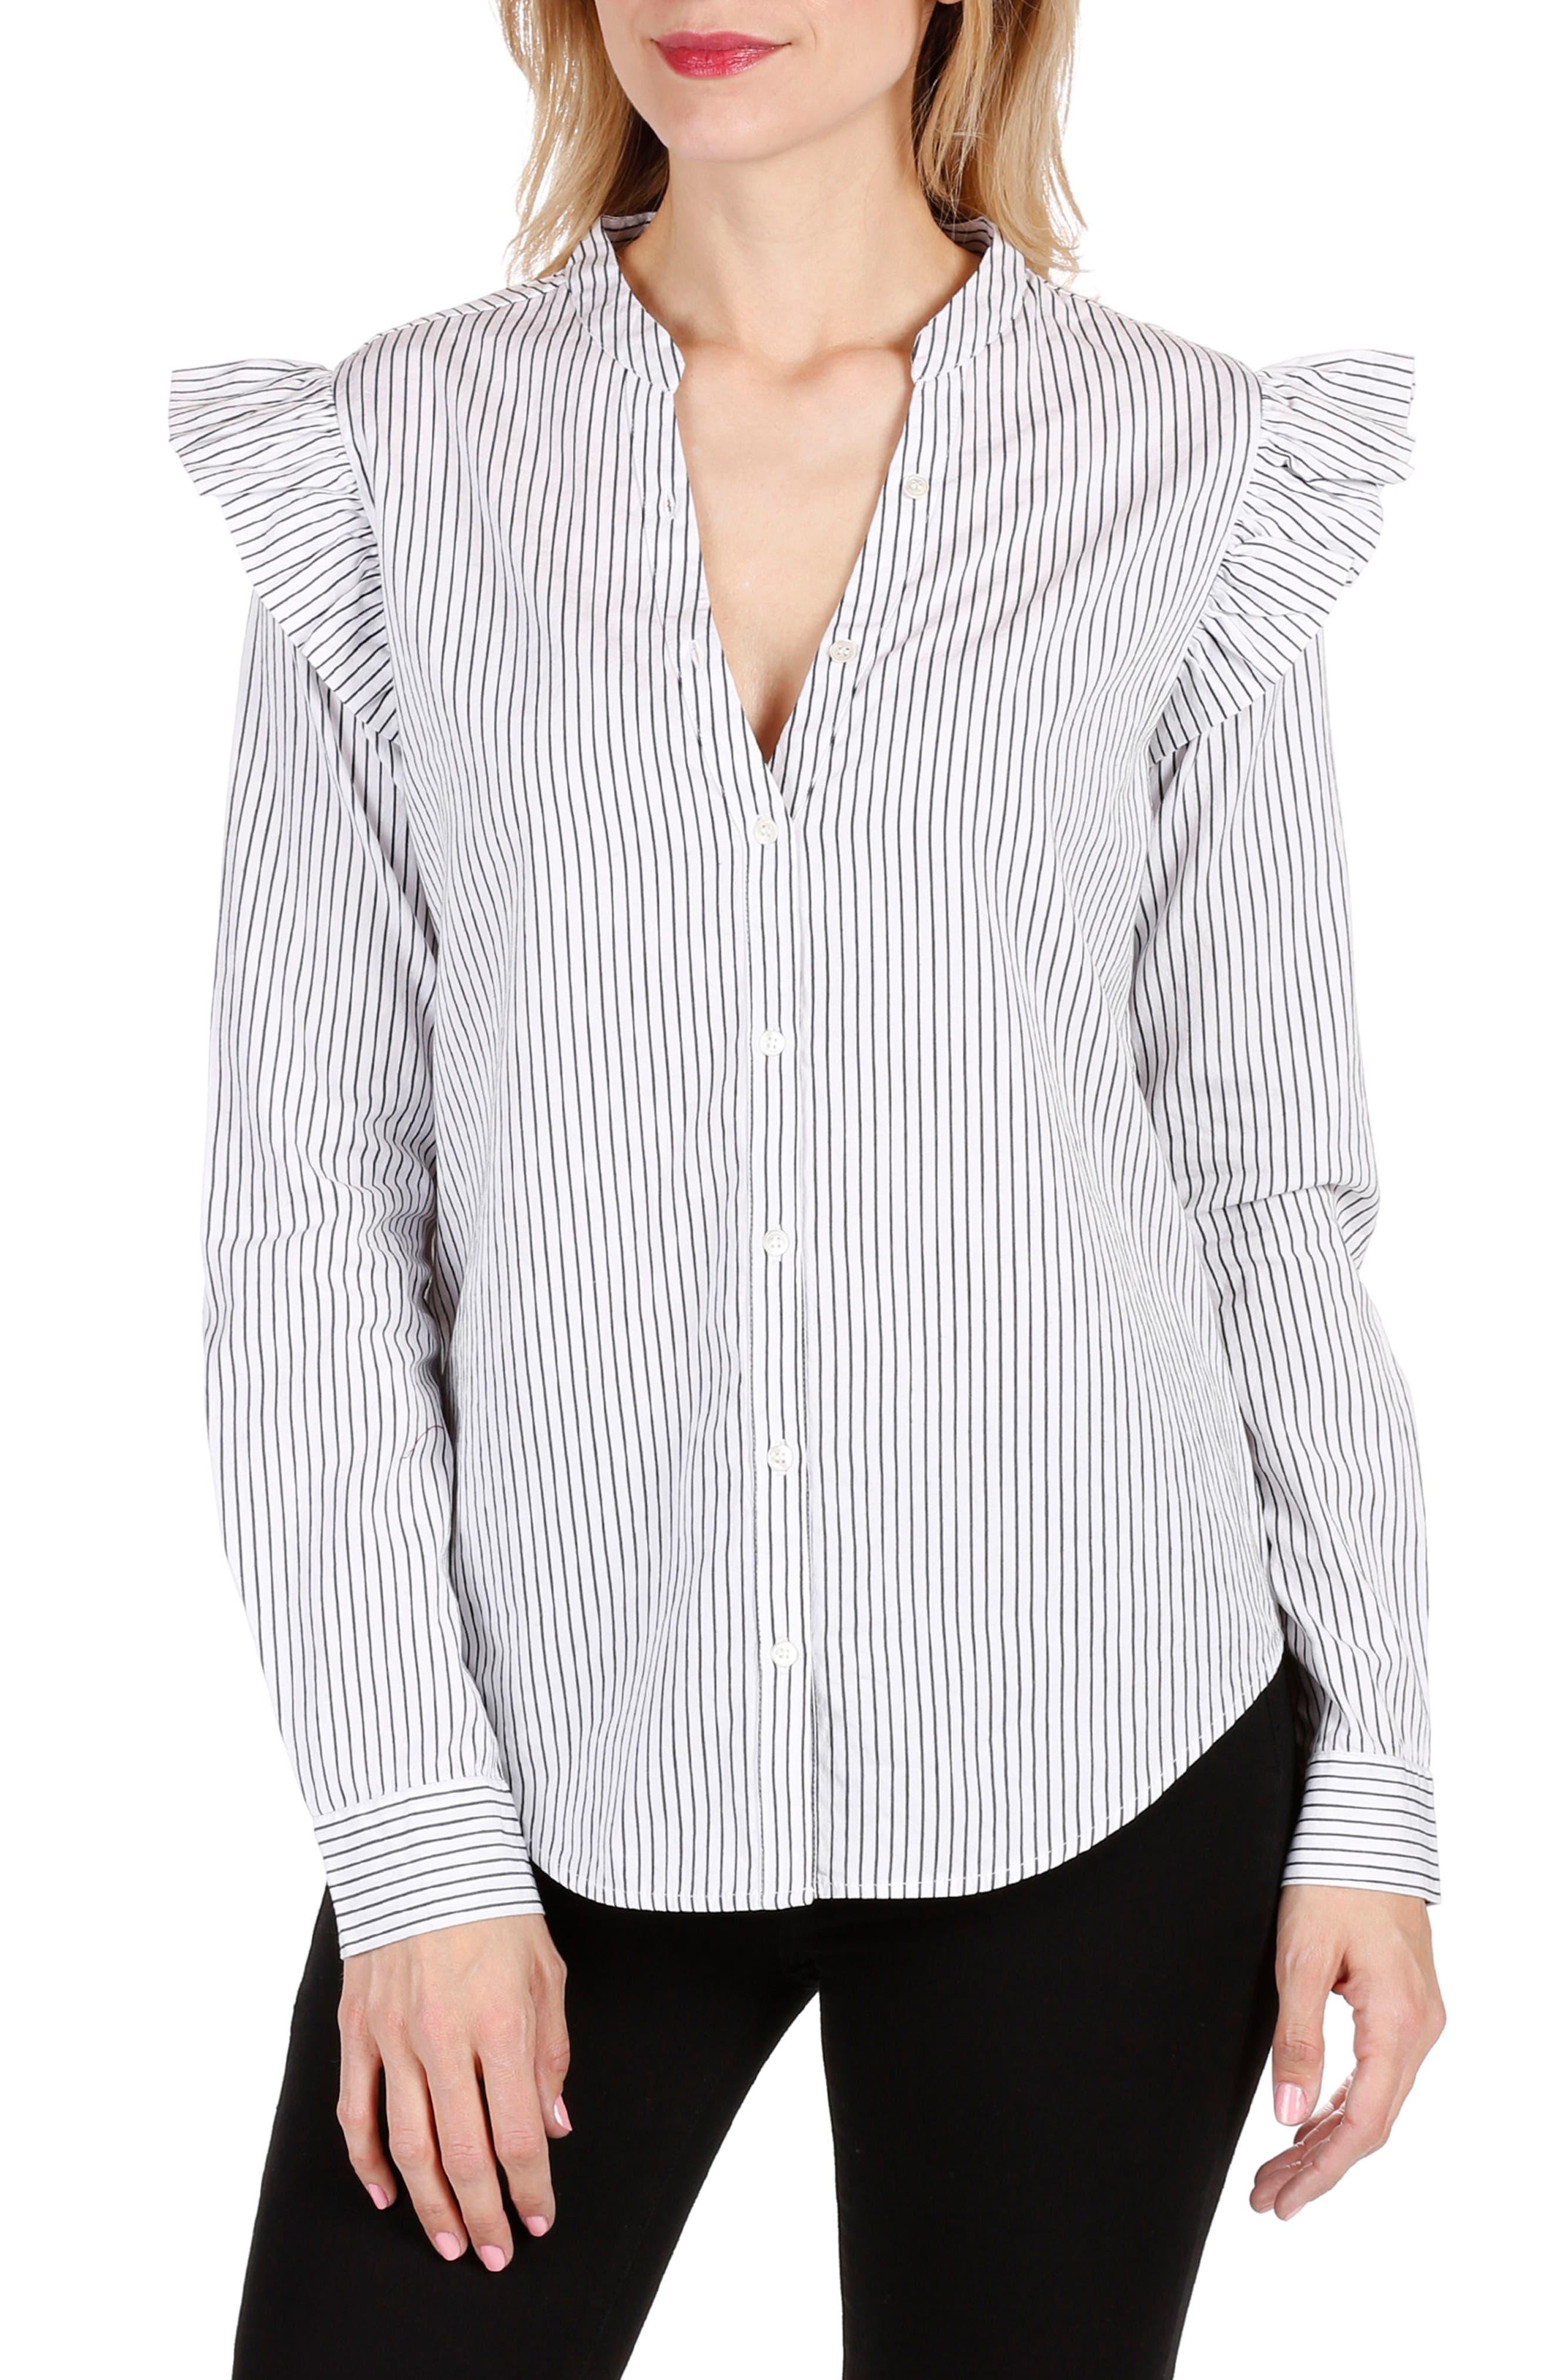 Jenelle Ruffle Dress Shirt,                         Main,                         color, 160